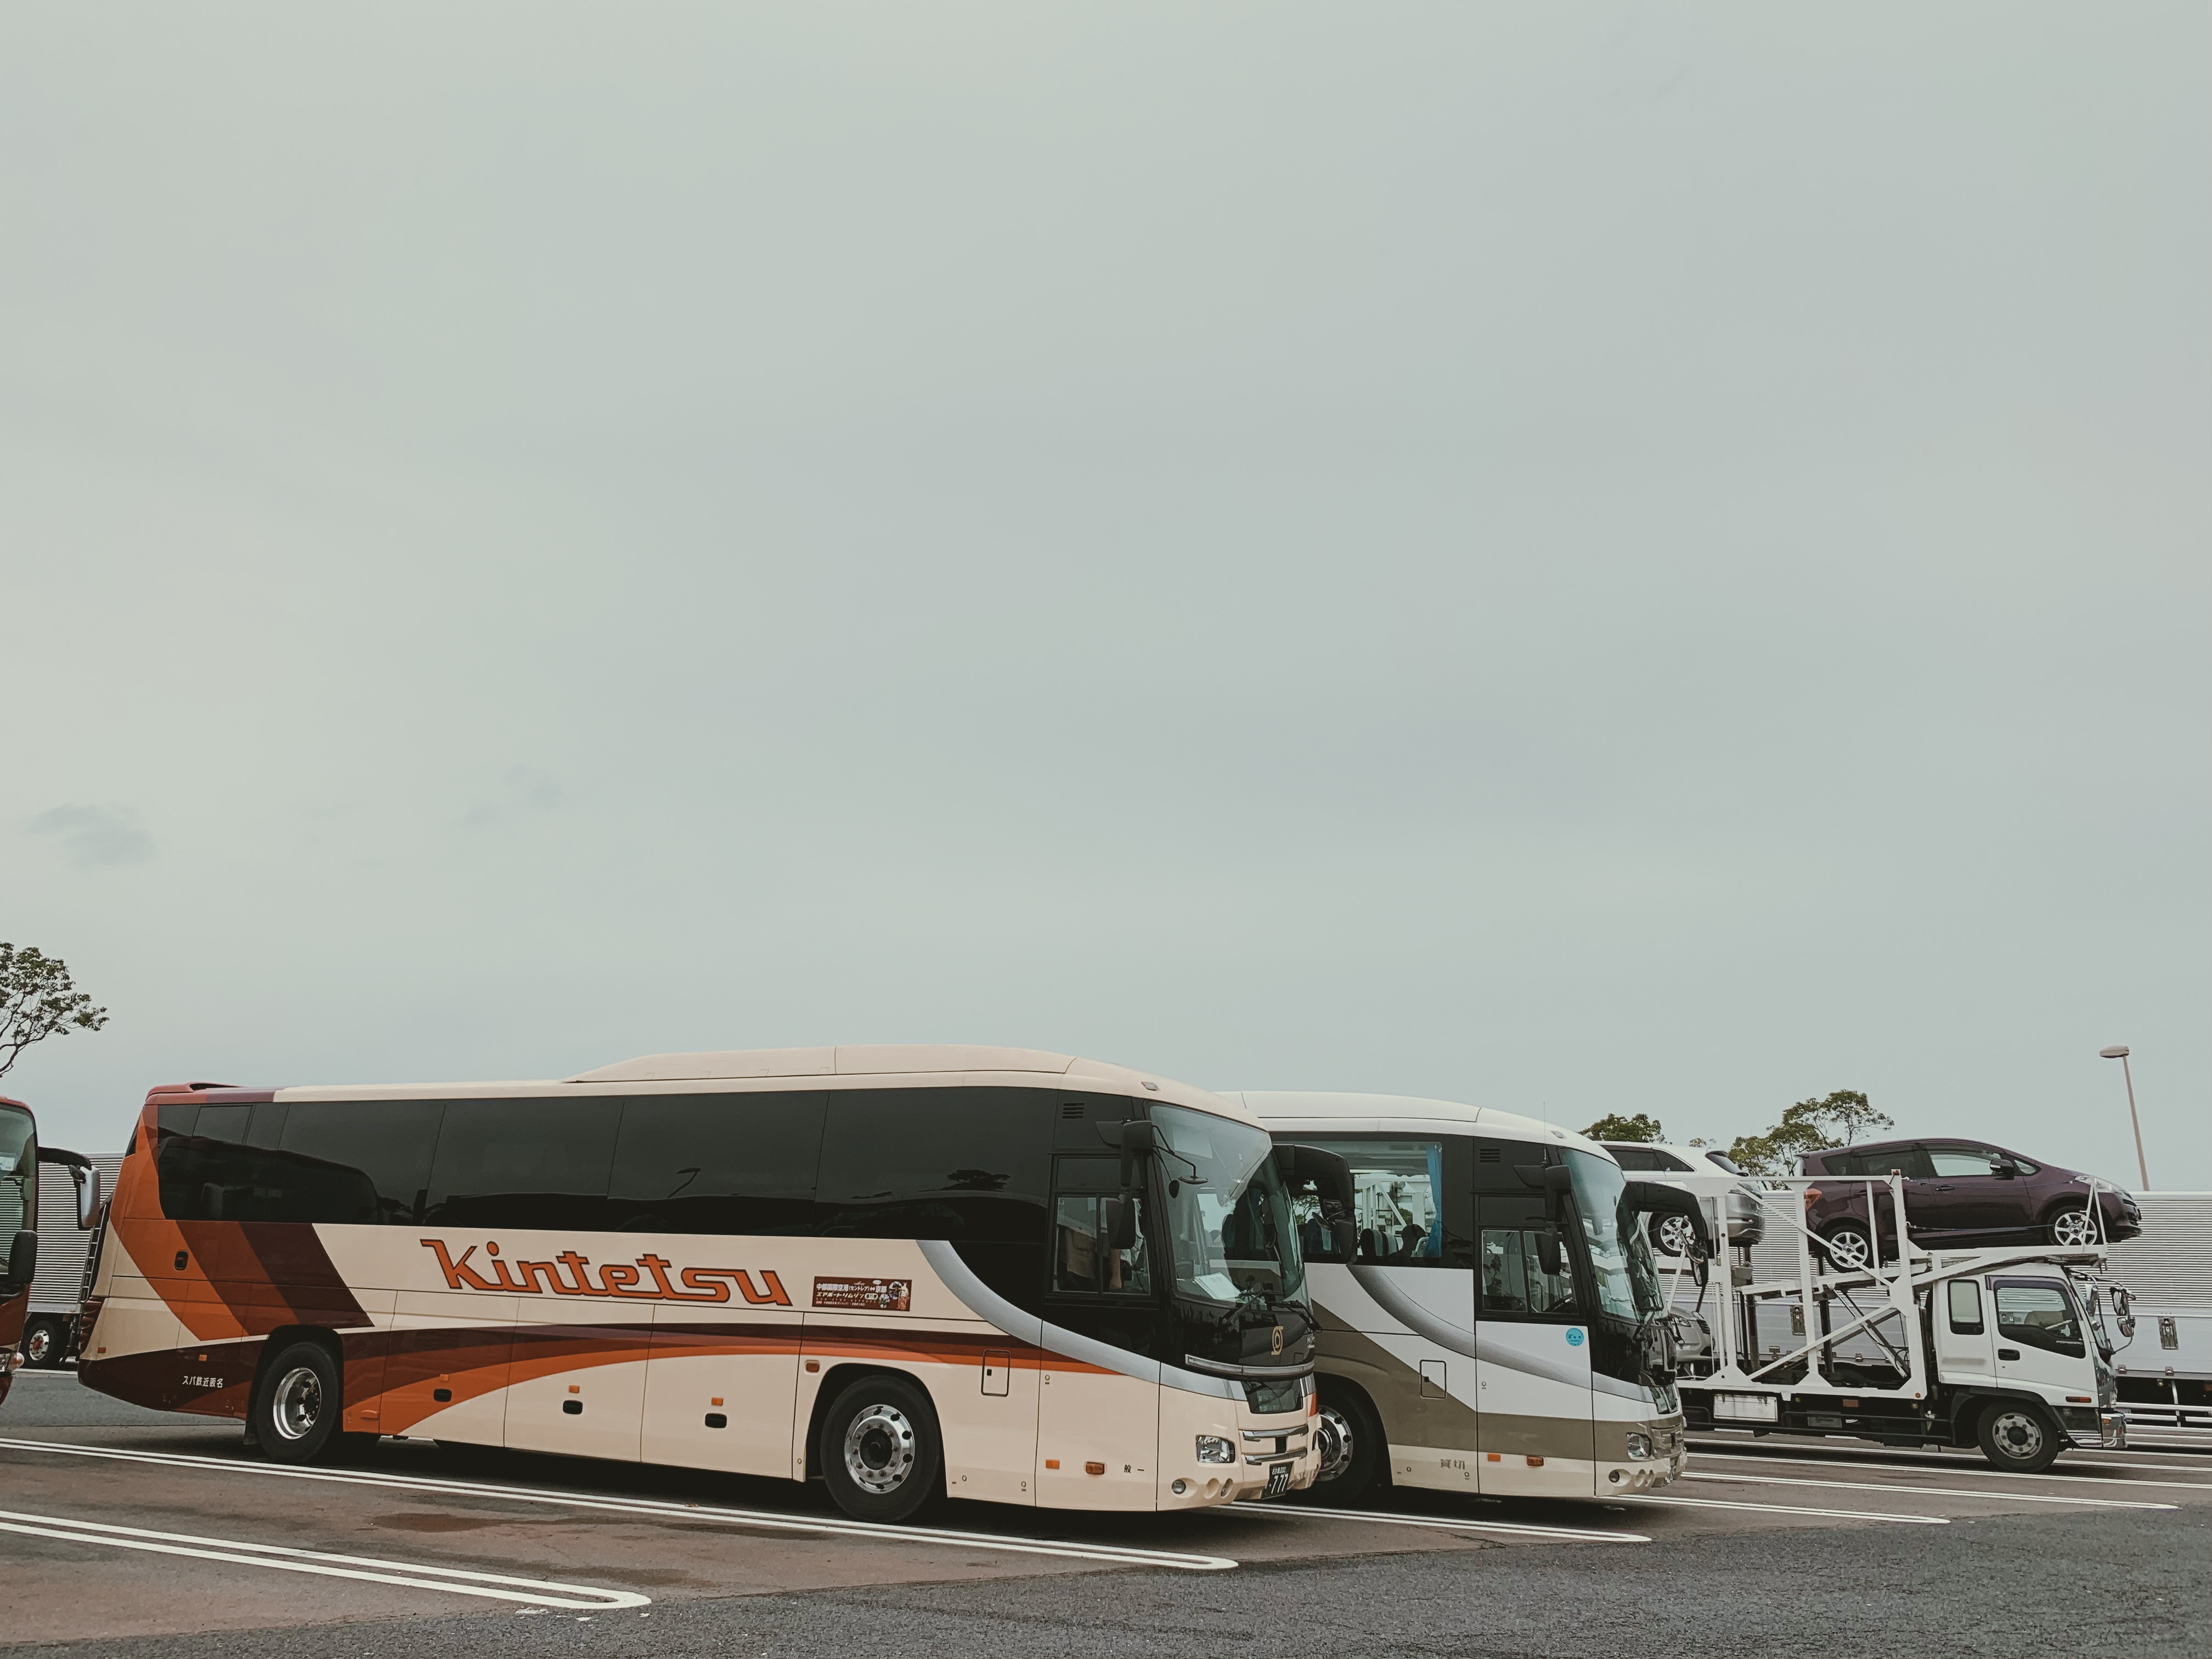 Kyoto Bus จากเกียวโต-สนามบินชูบุ นาโกย่า